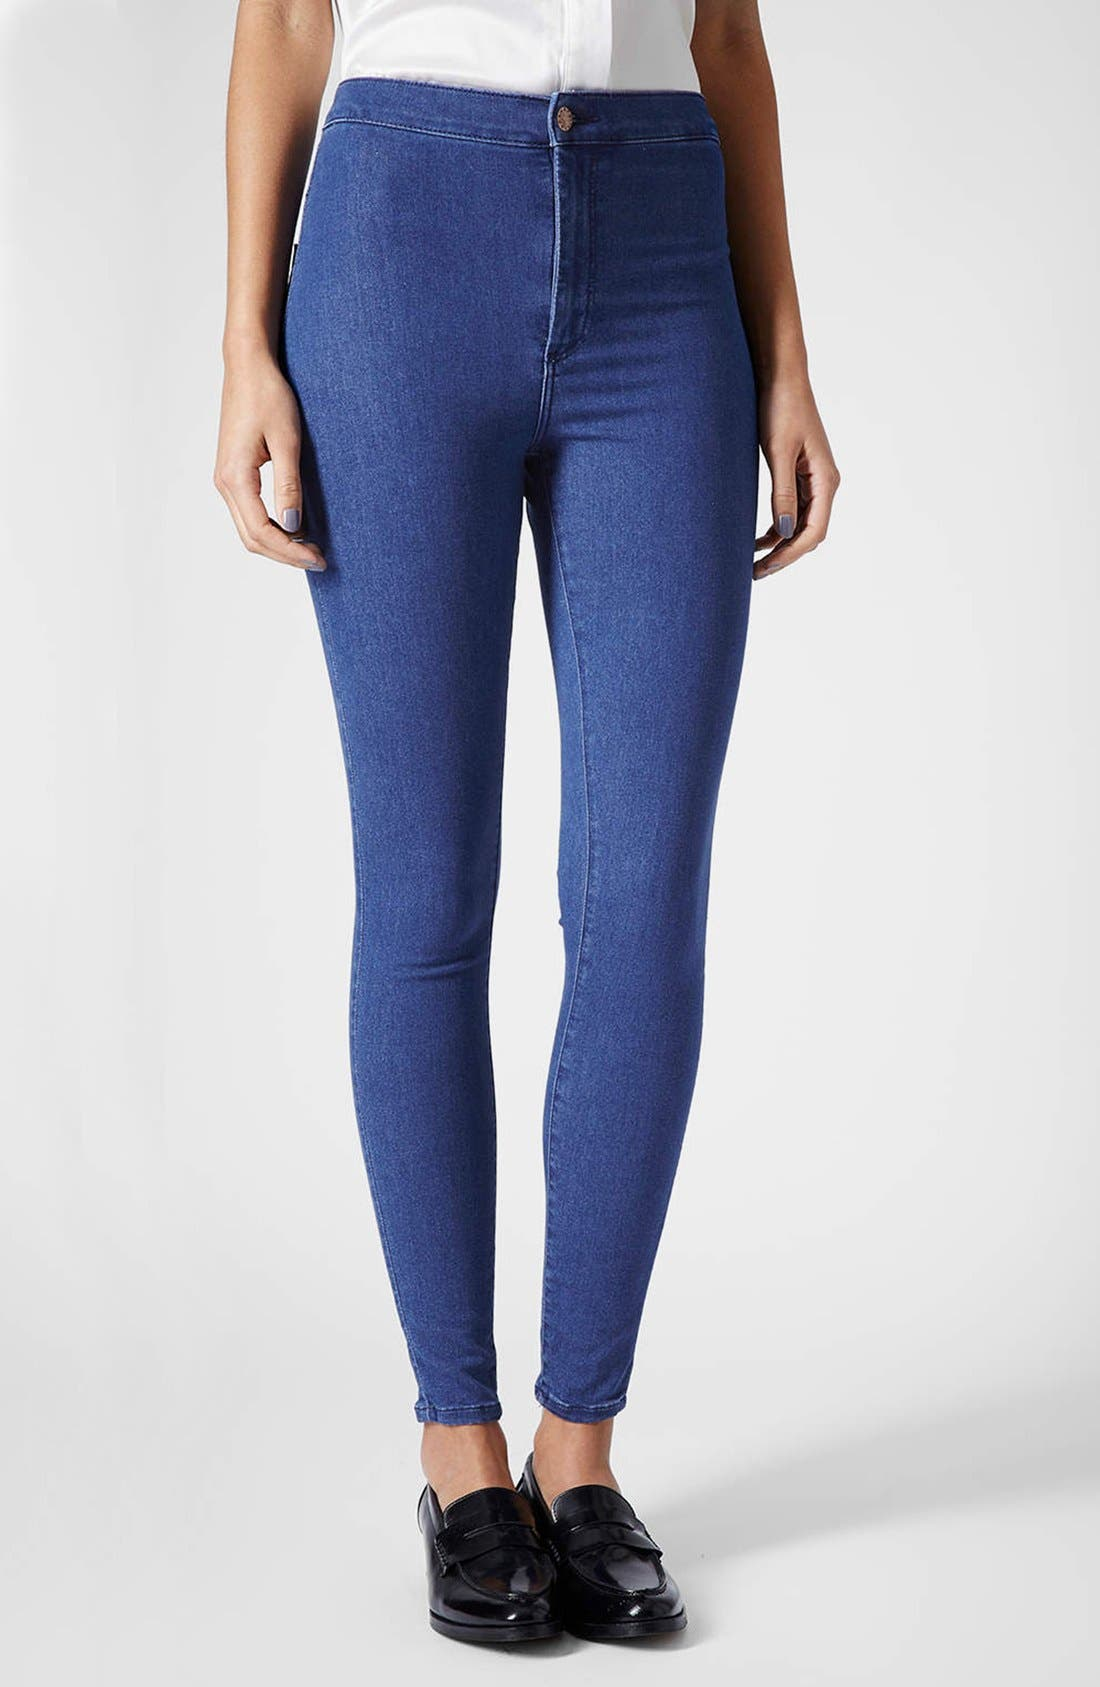 Alternate Image 1 Selected - Topshop Moto 'Joni' High Rise Skinny Jeans (Regular, Short & Long) (Blue)